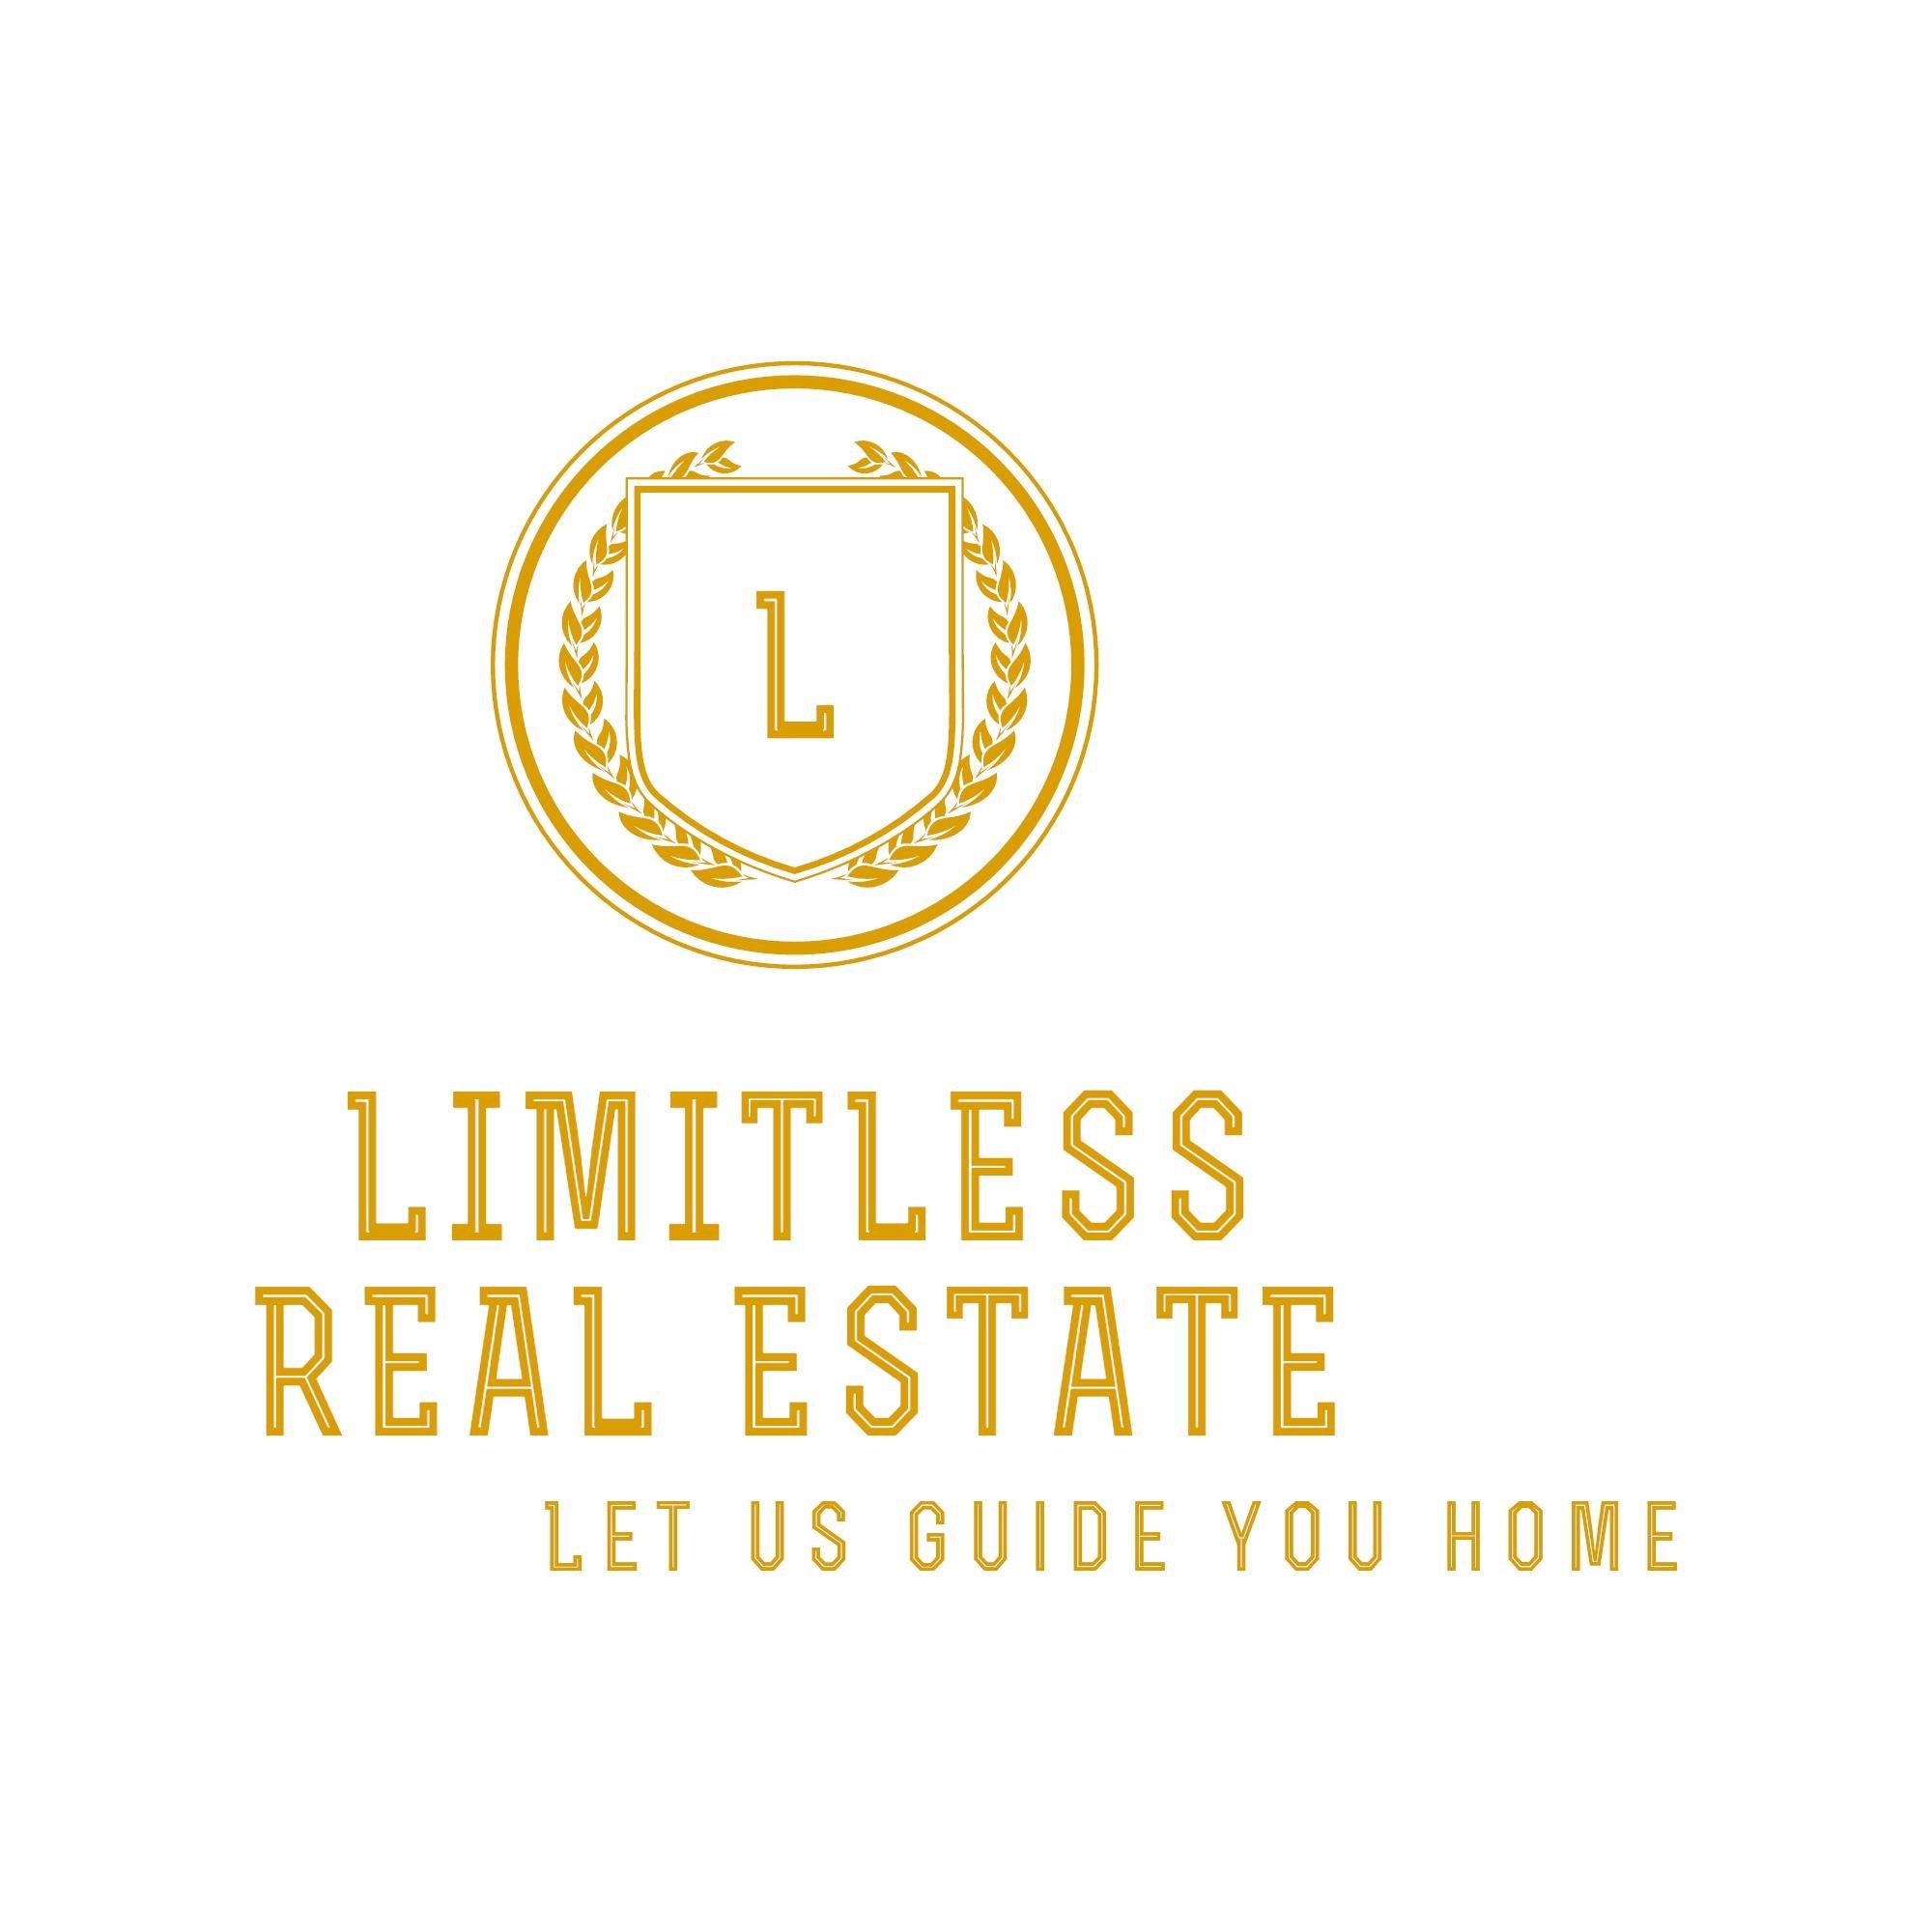 Limitless Real Estate